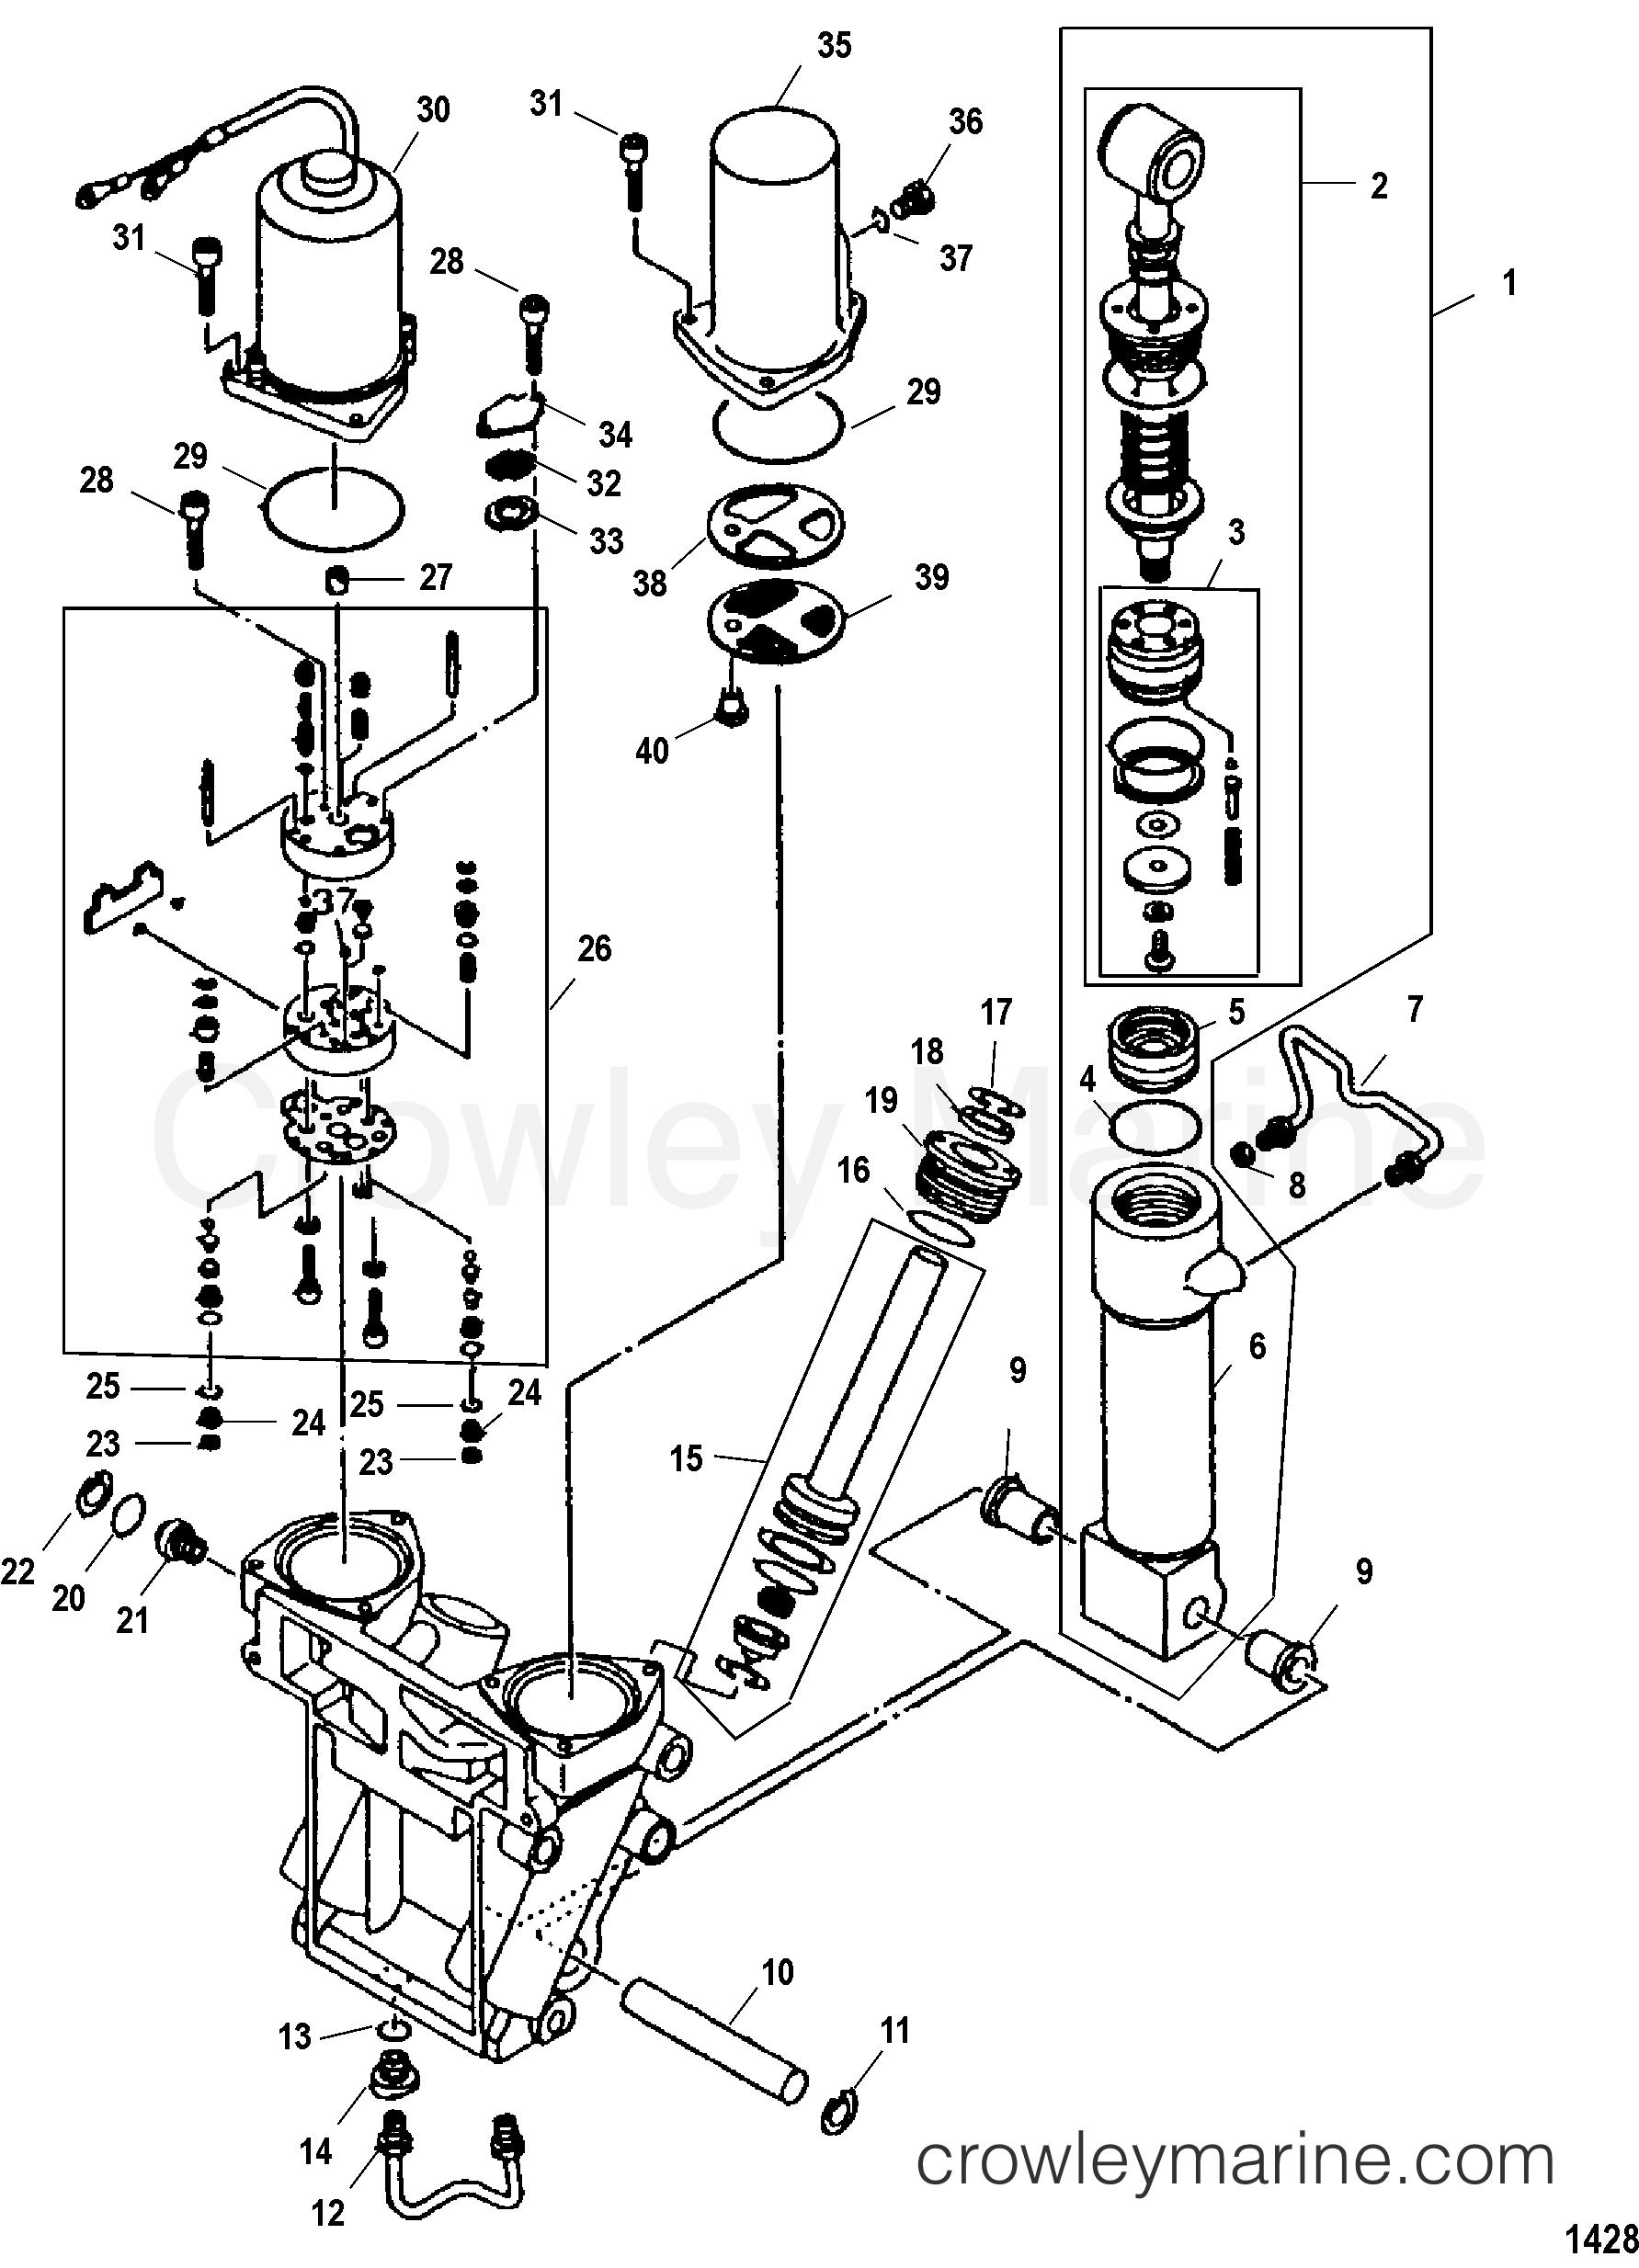 POWER TRIM COMPONENTS - 2003 Mercury Outboard 225EFI [CXL 4